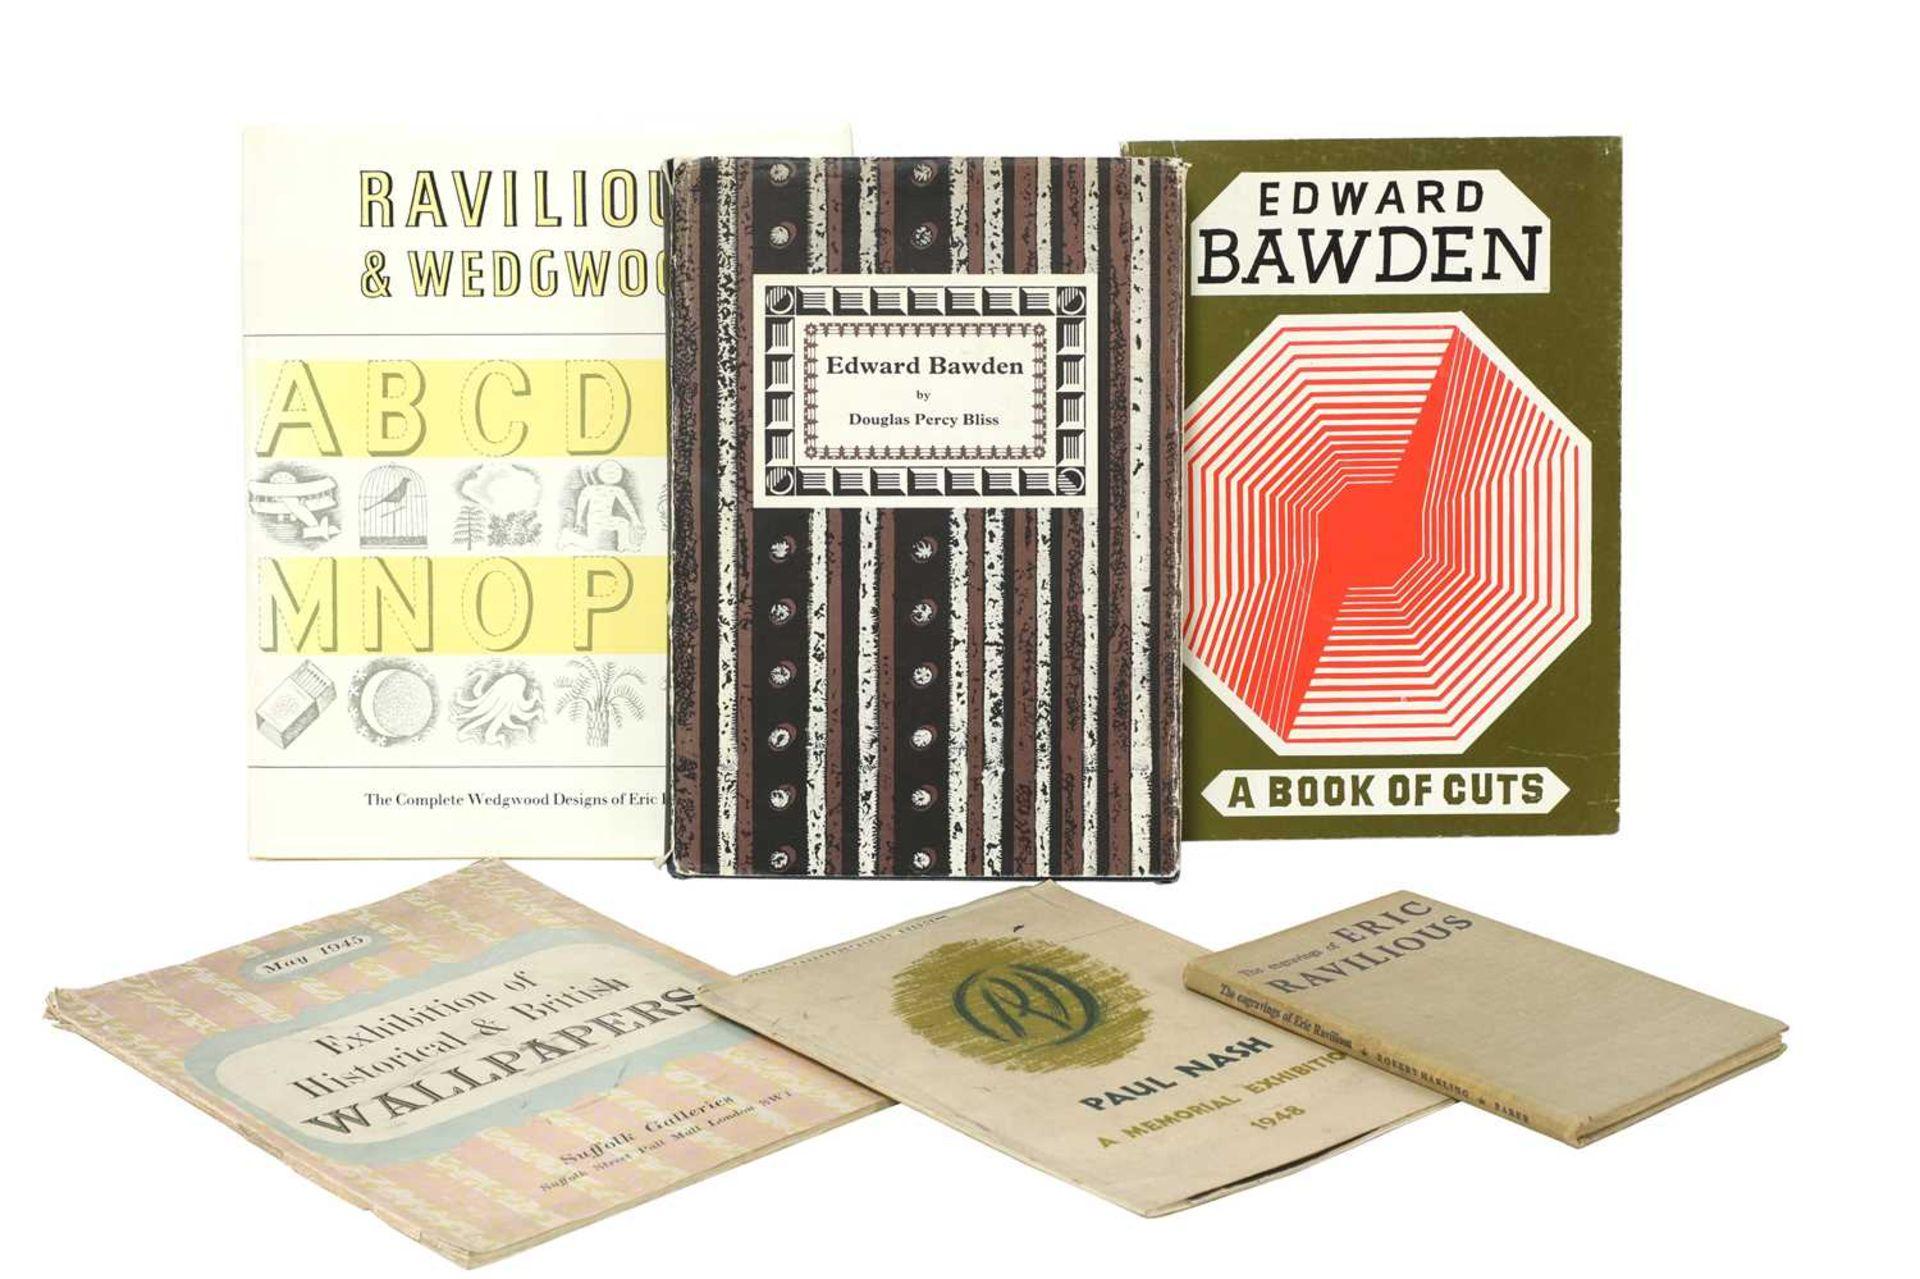 'Edward Bawden' by Douglas Percy Bliss,